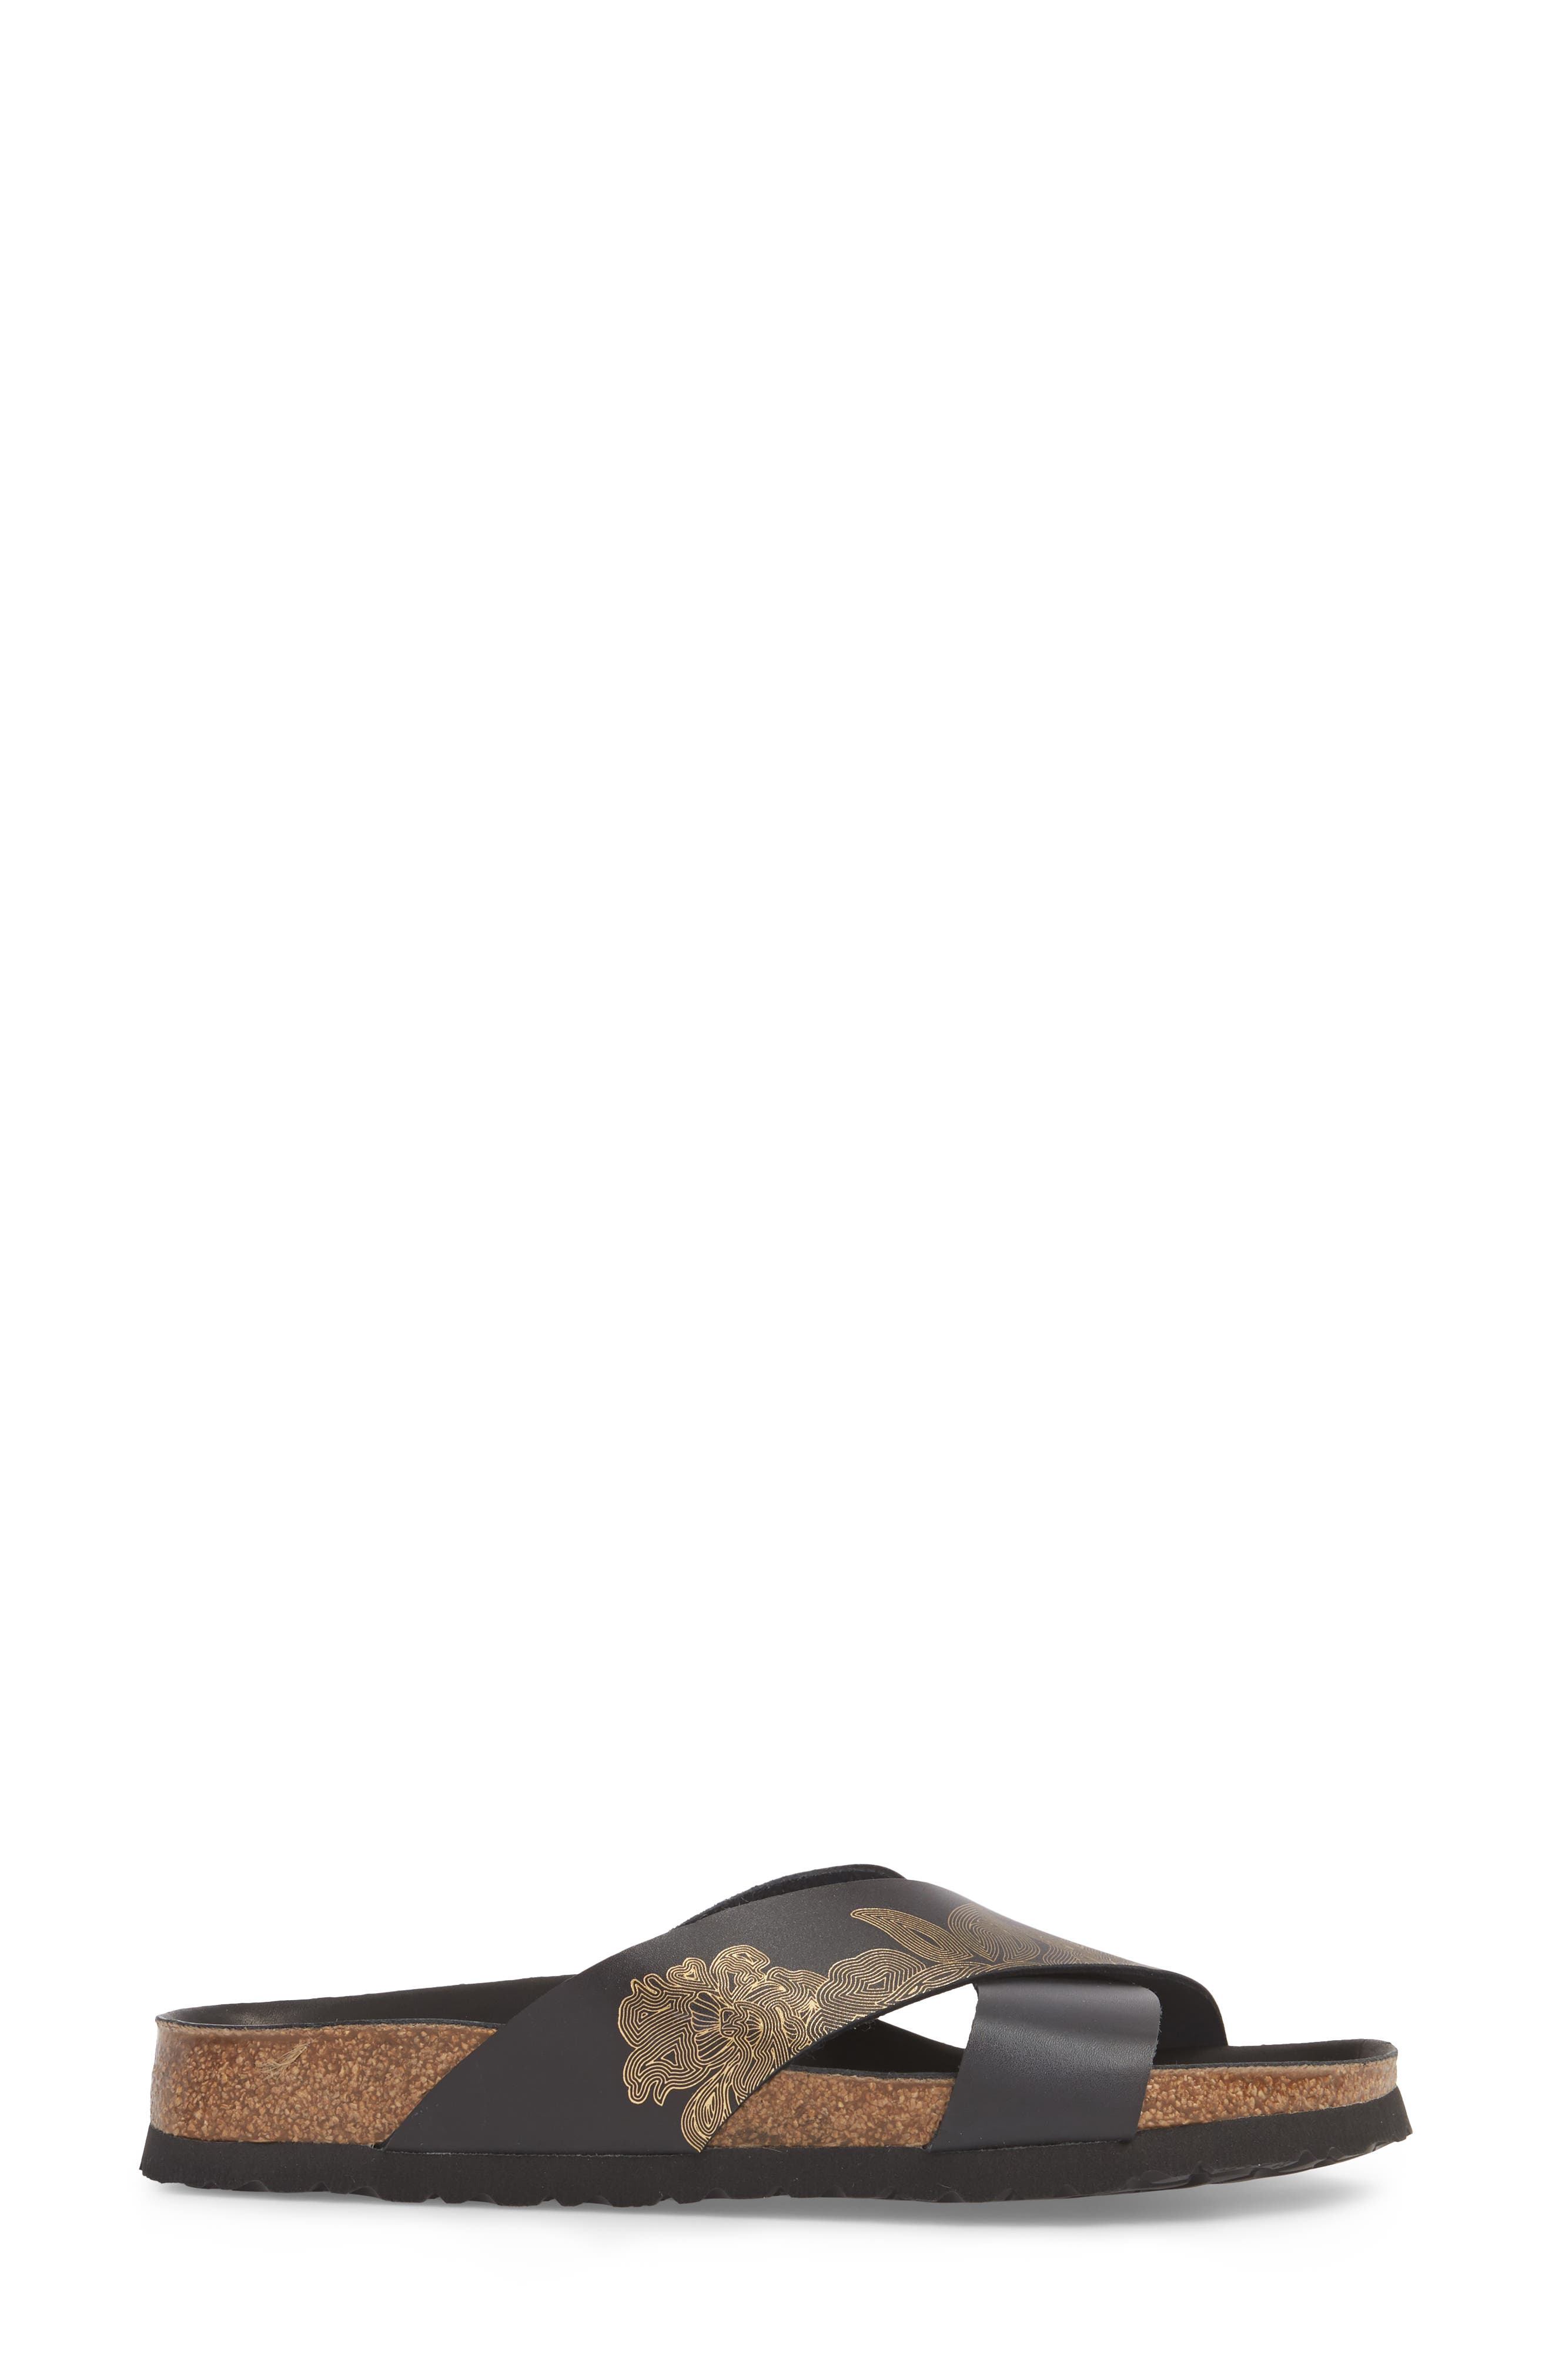 Papillio by Birkenstock Daytona Hex Slide Sandal,                             Alternate thumbnail 3, color,                             Ornaments Black Leather